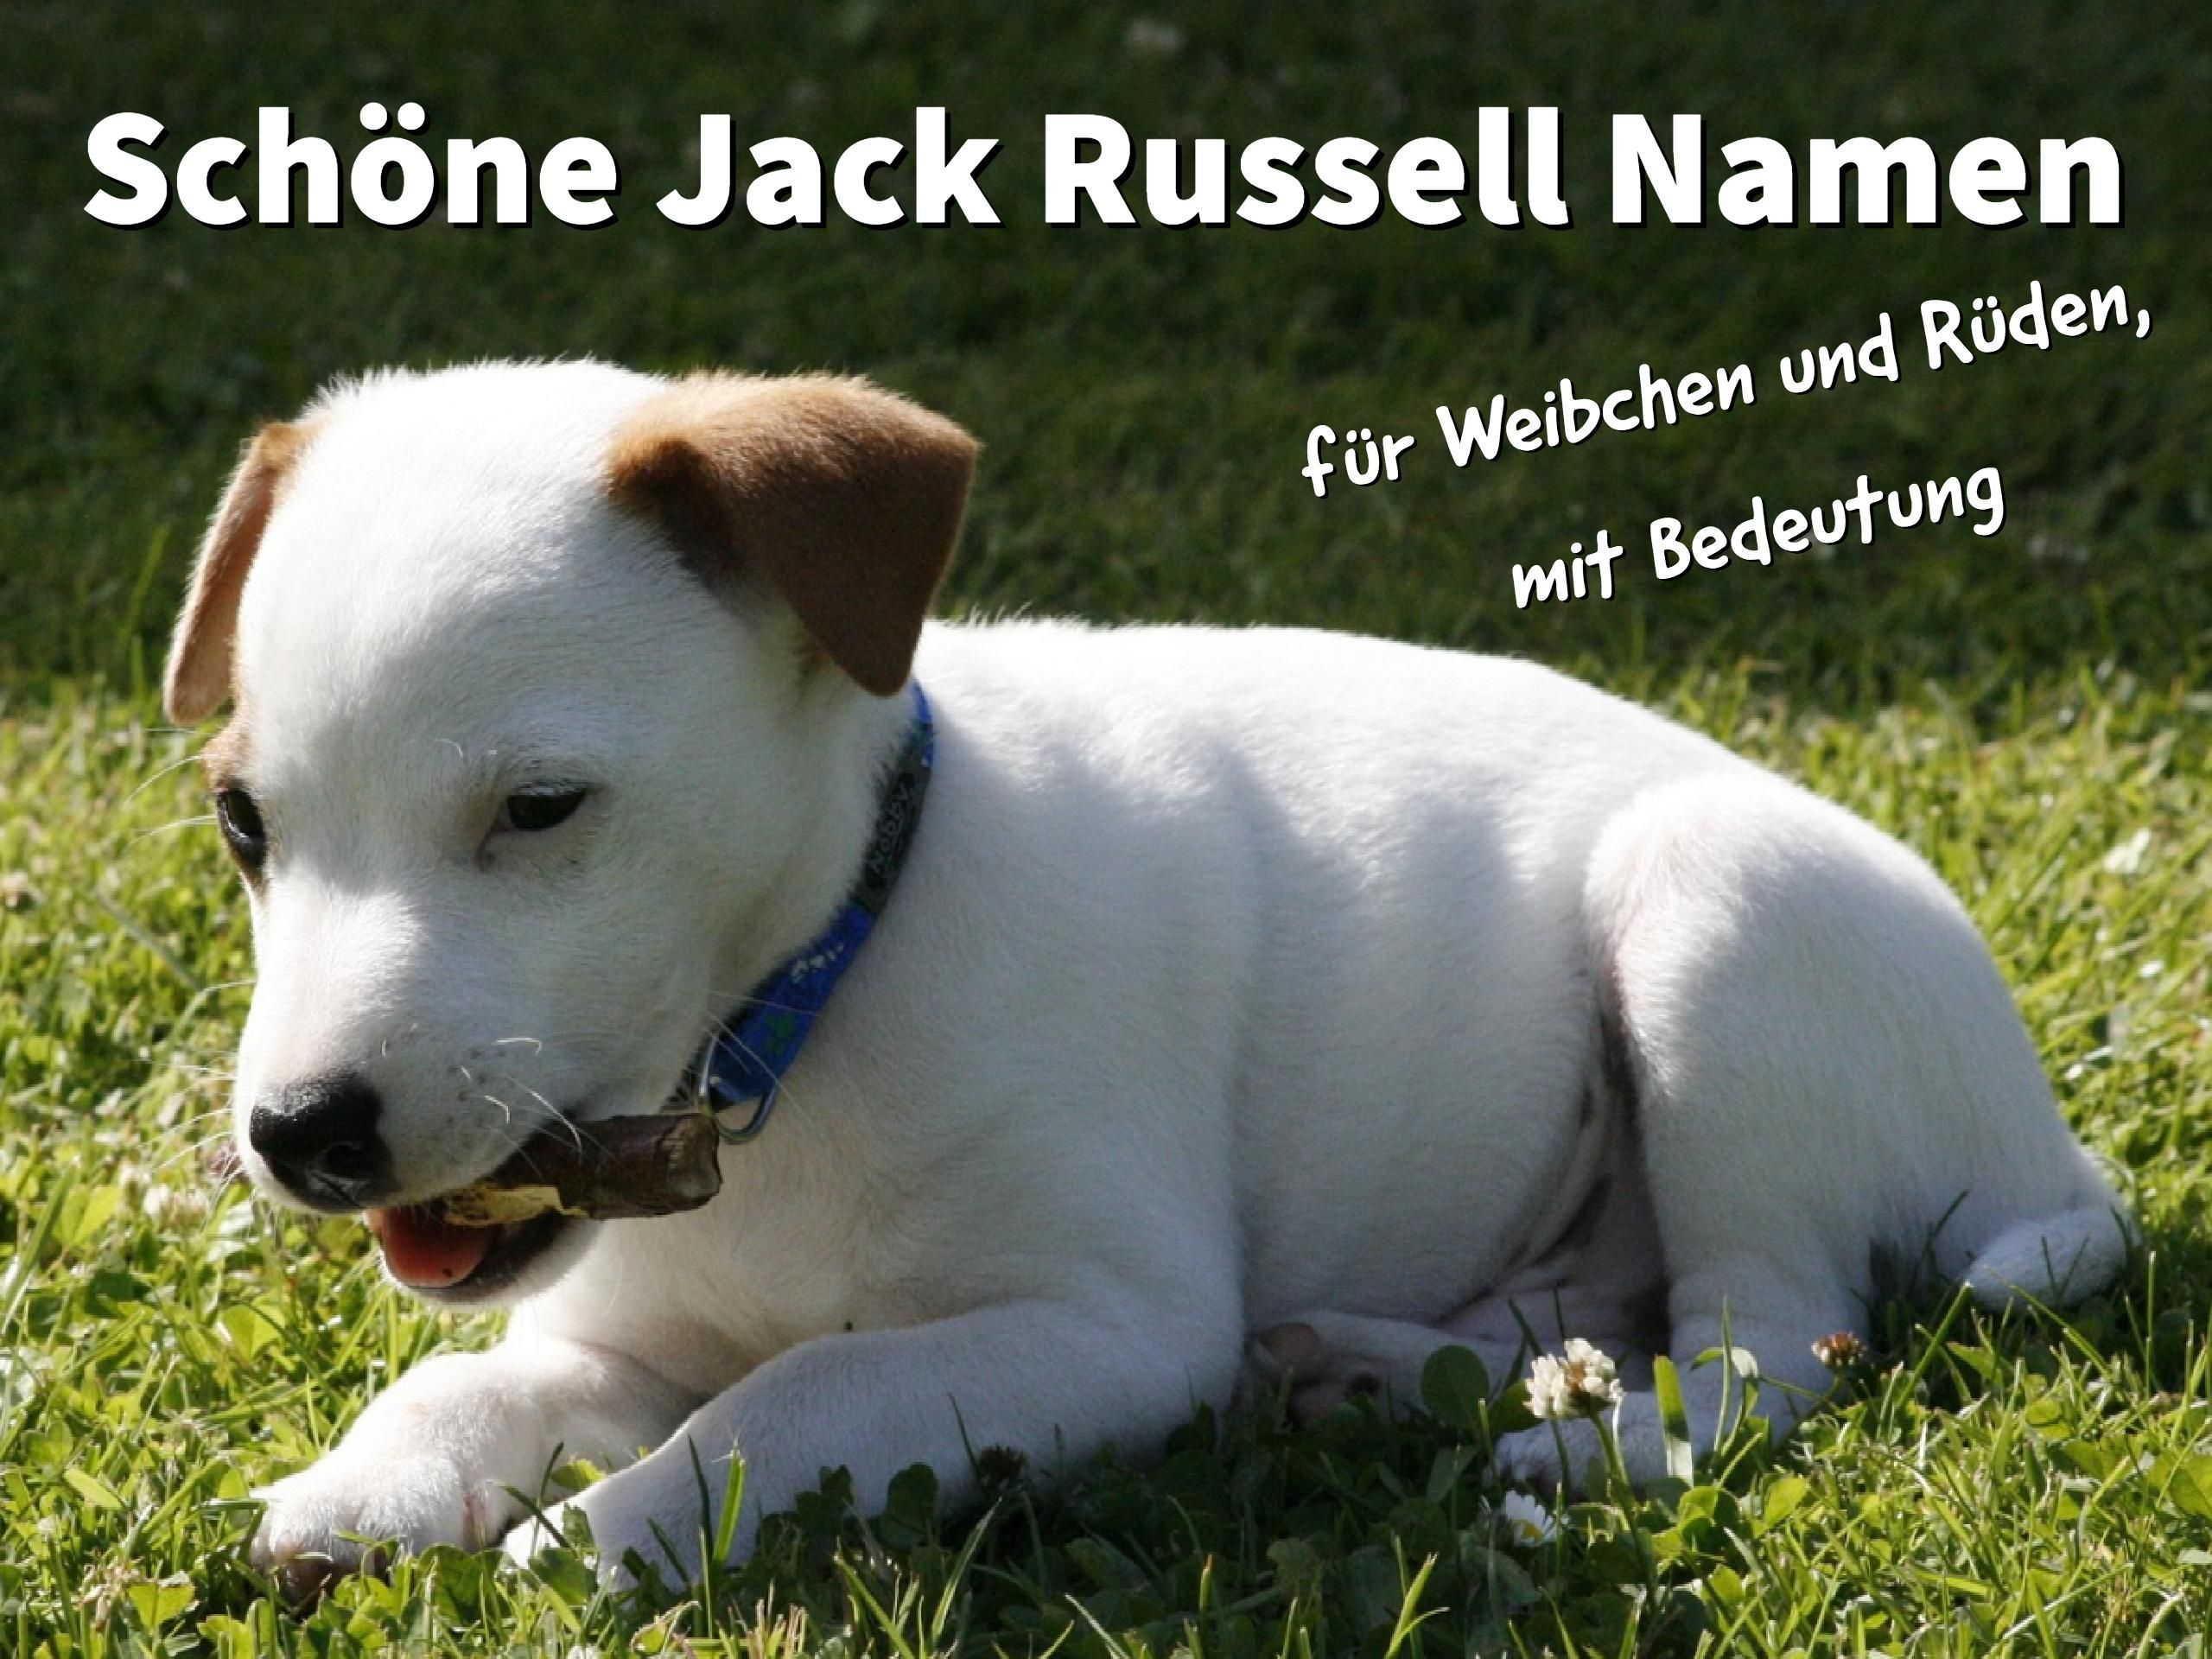 21 Schone Jack Russell Namen Fur Weibchen Und Ruden Mit Bedeutung Jack Russel Welpe Hundenamen Weibchen